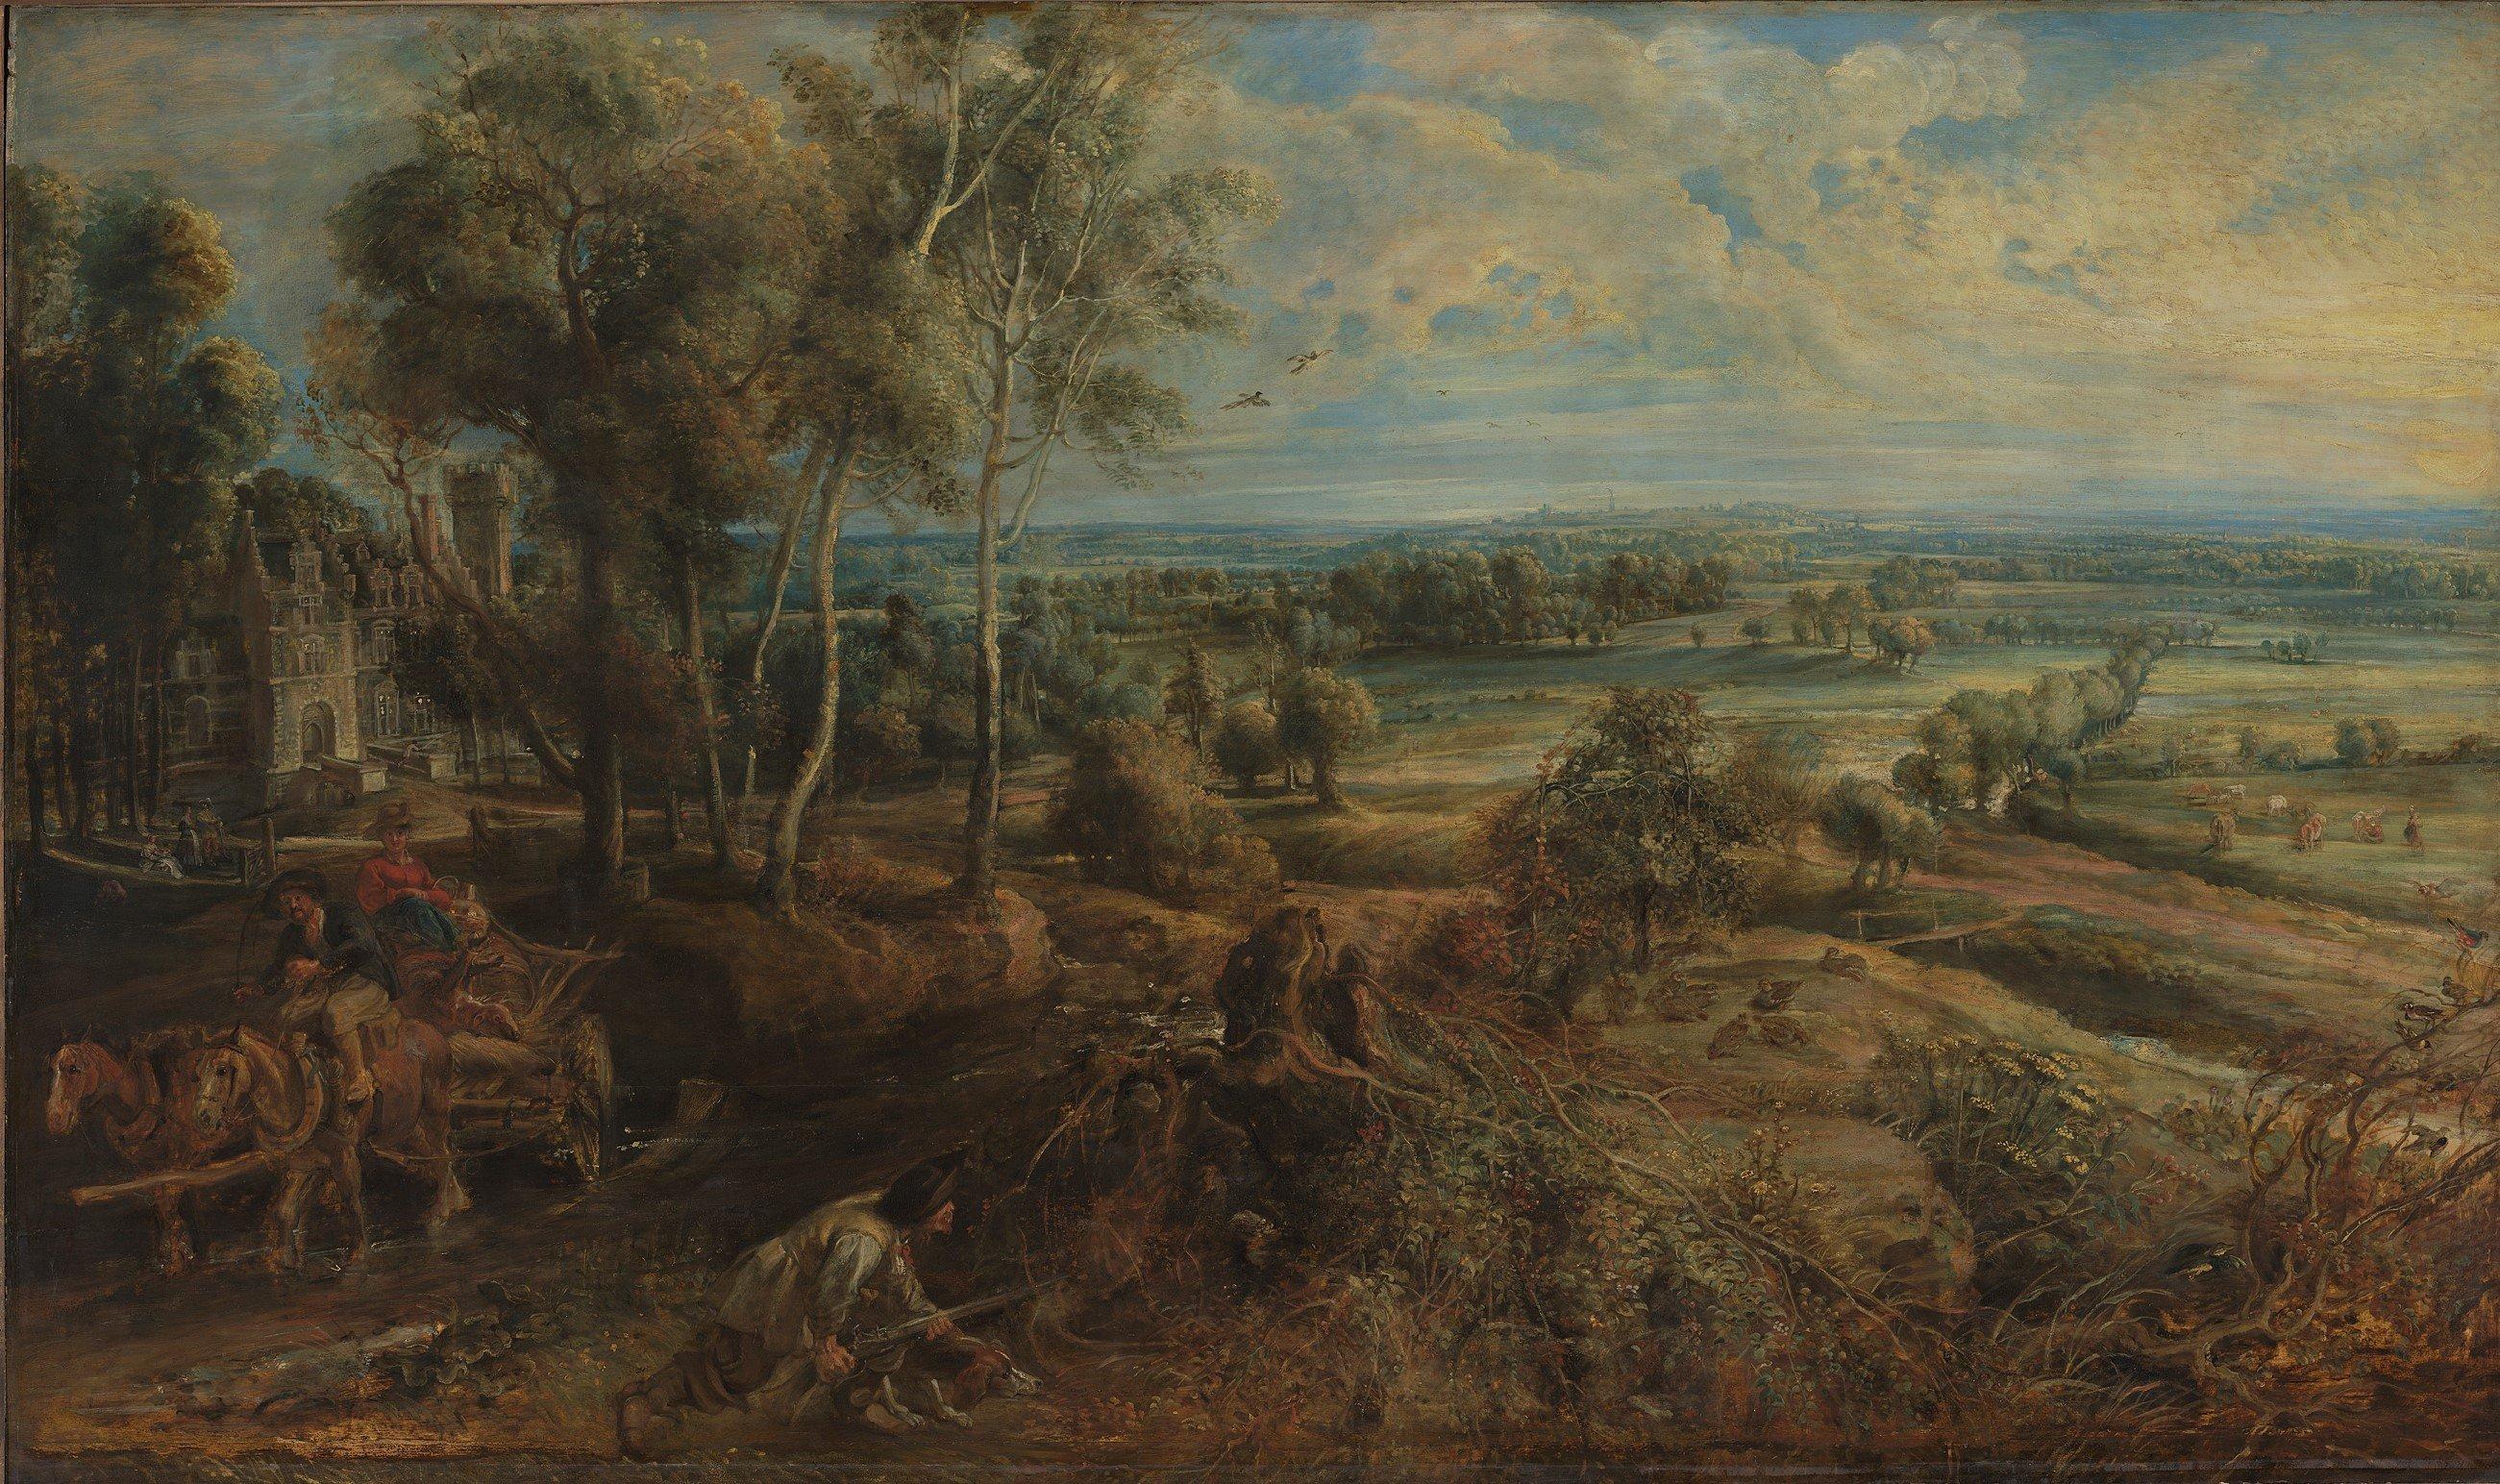 Rubens masterpiece going on show following 'revelatory' conservation work